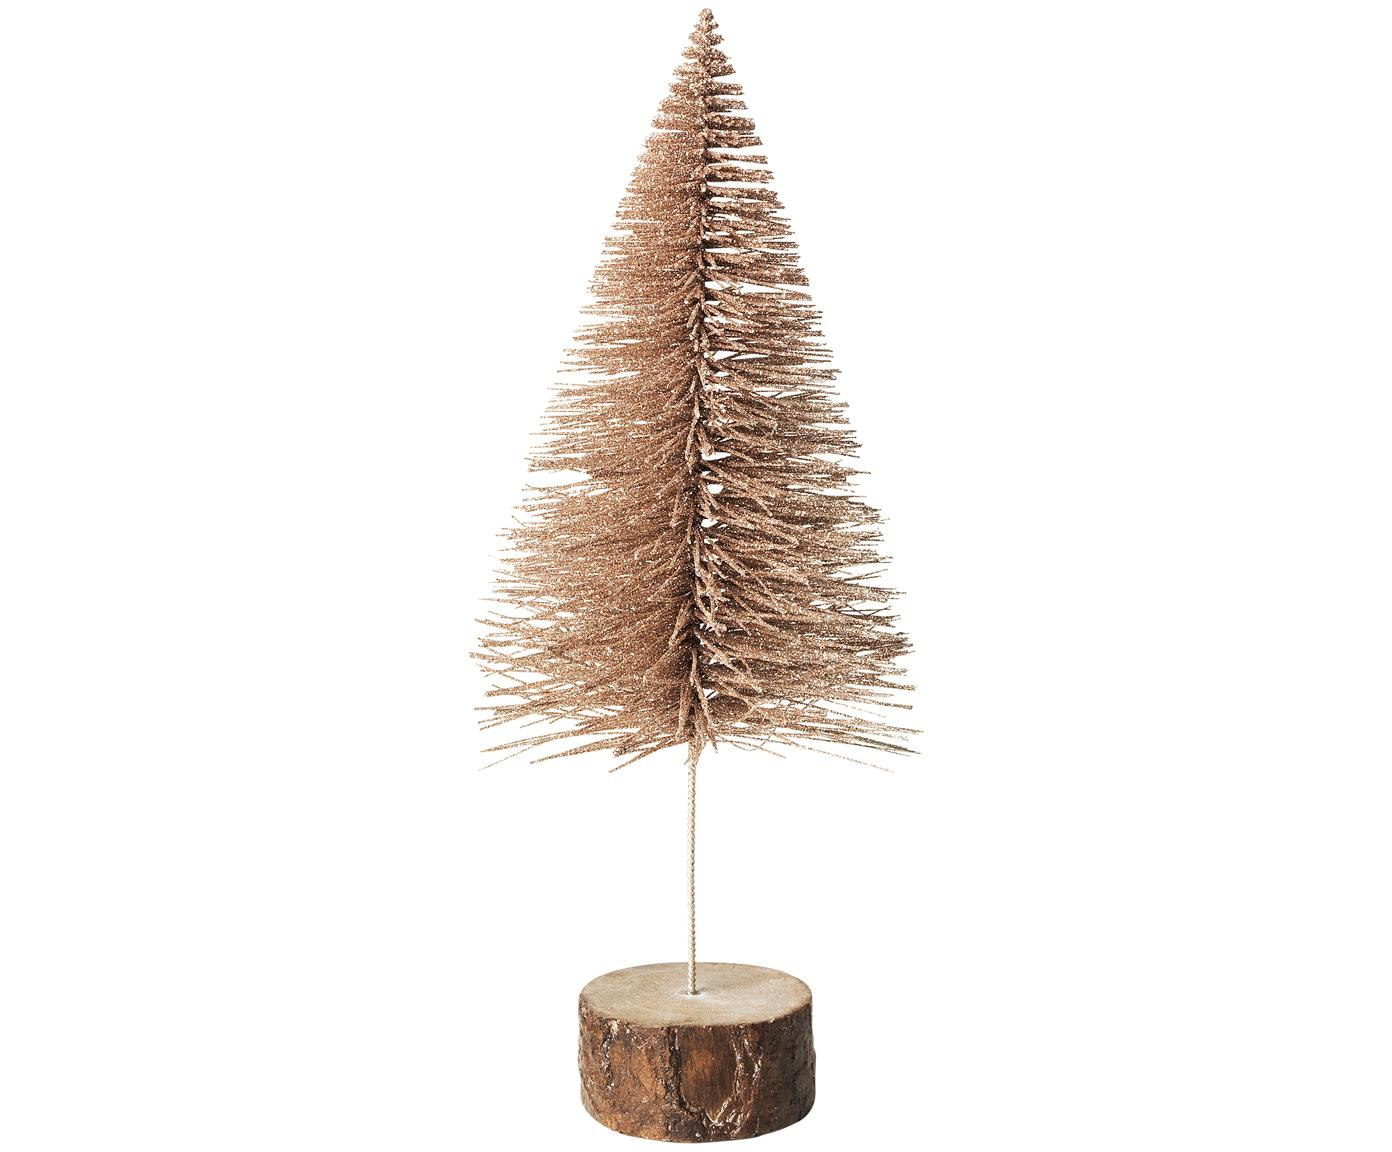 Decoratief object Christmas Tree, Voetstuk: polyresin, Champagnekleurig, bruin, Ø 12 x H 29 cm